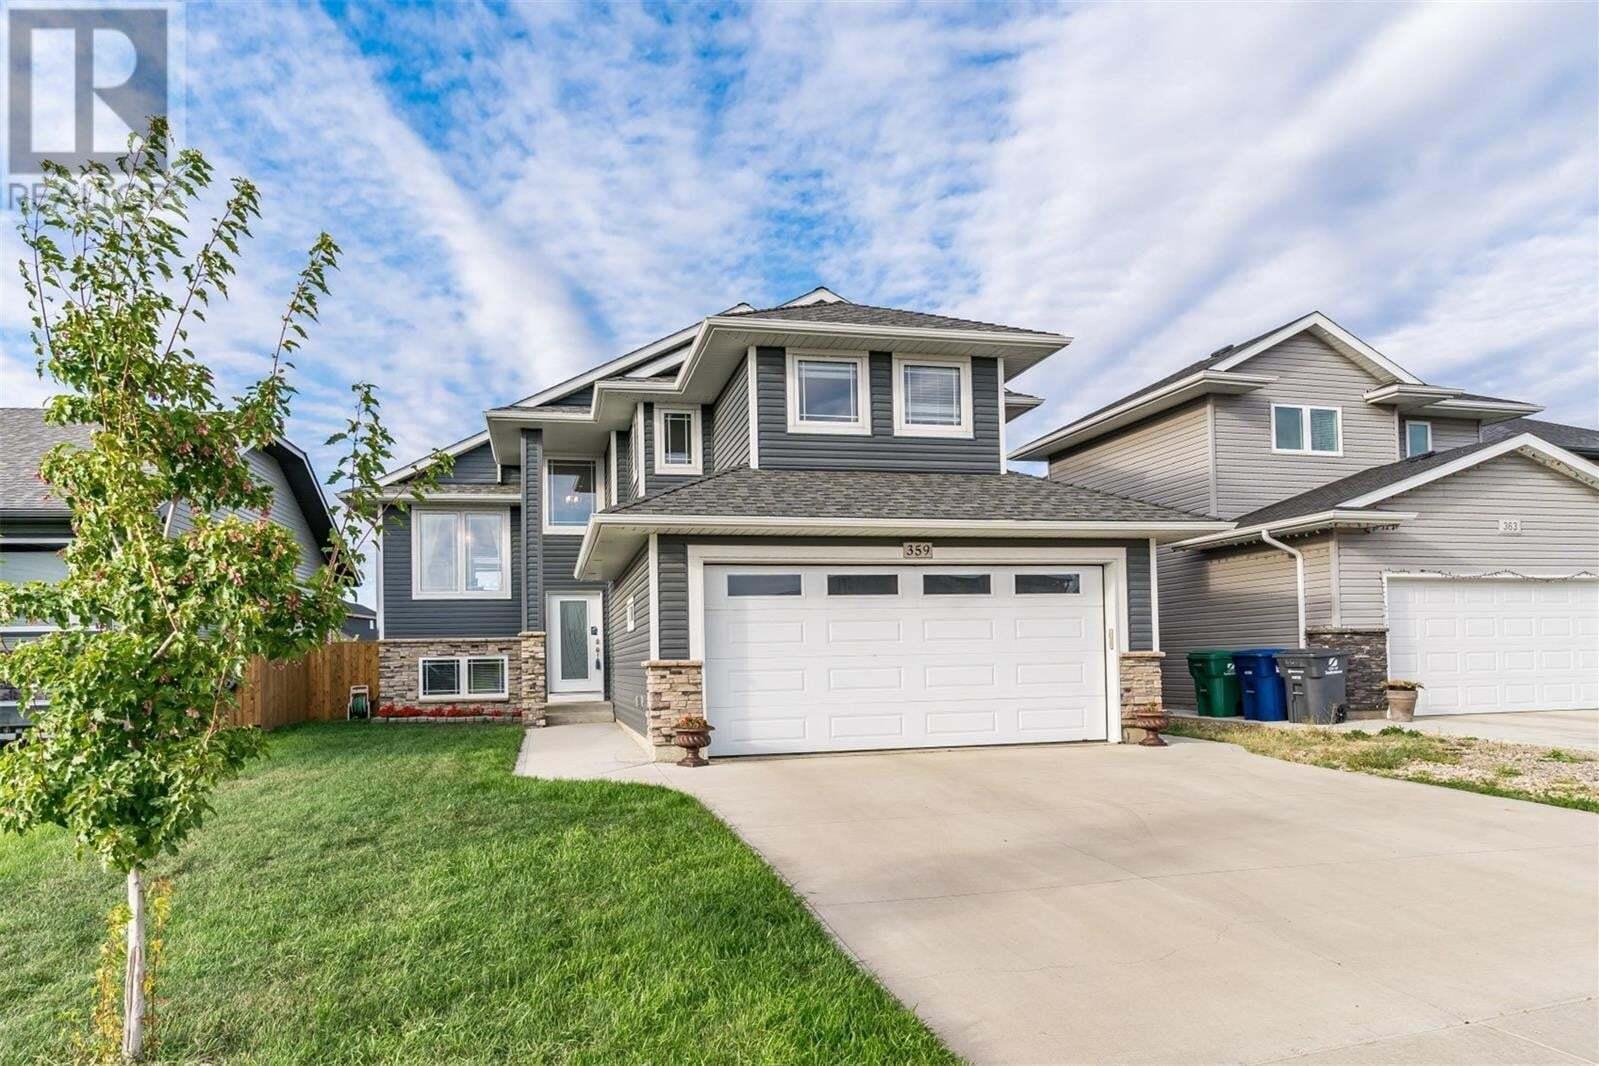 House for sale at 359 Pringle Ct Saskatoon Saskatchewan - MLS: SK826916